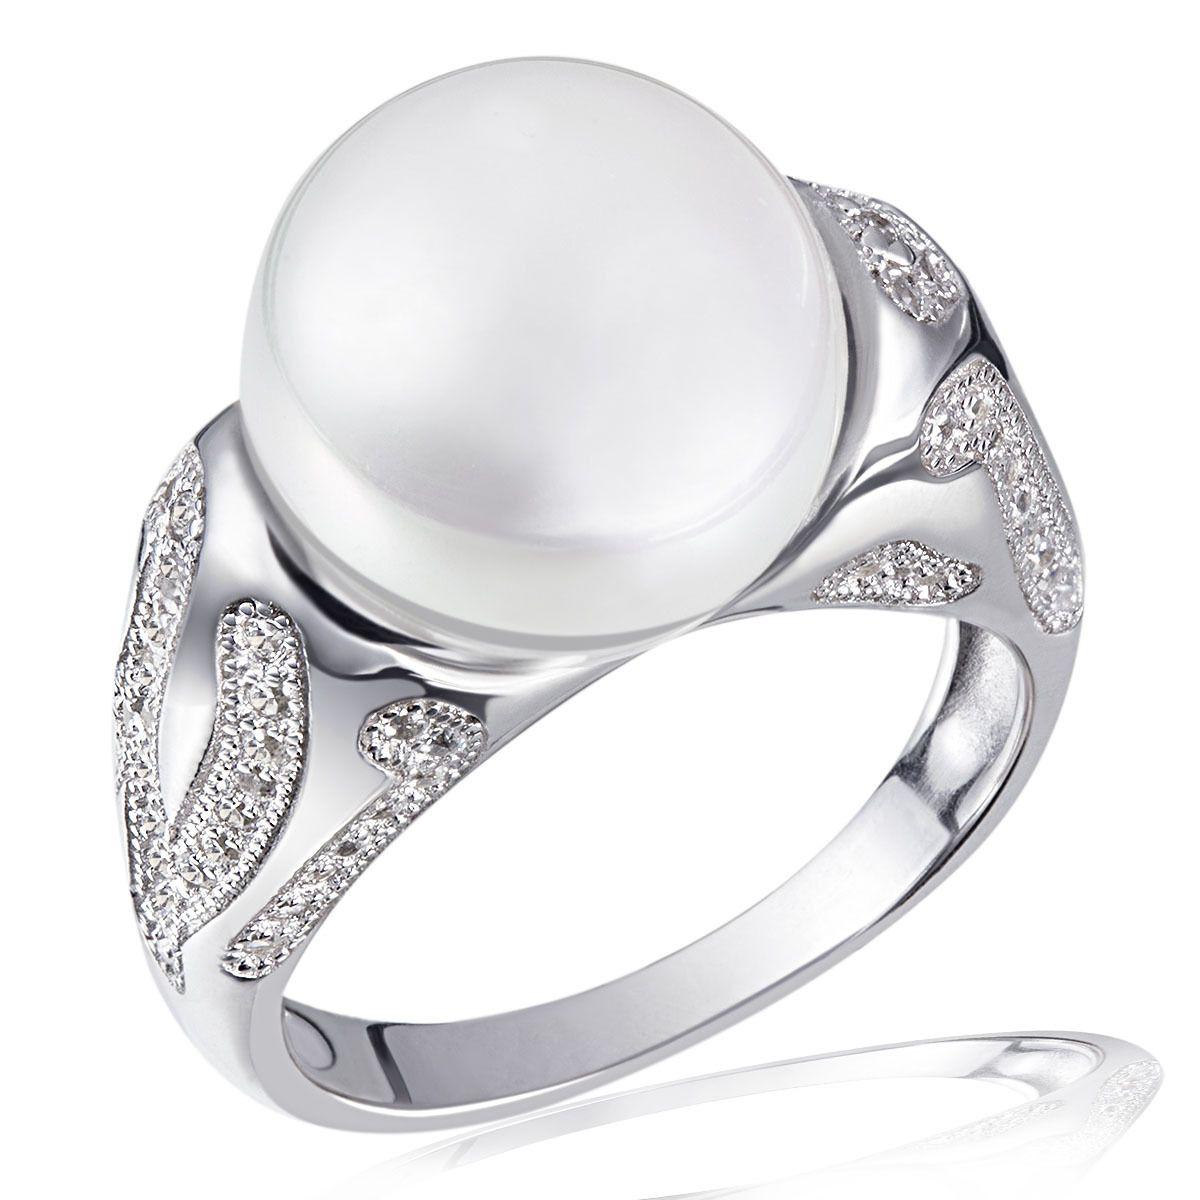 AVERDIN Averdin Damenring 925/-  Silber 1 Glasperle 81 weiße Zirkonia